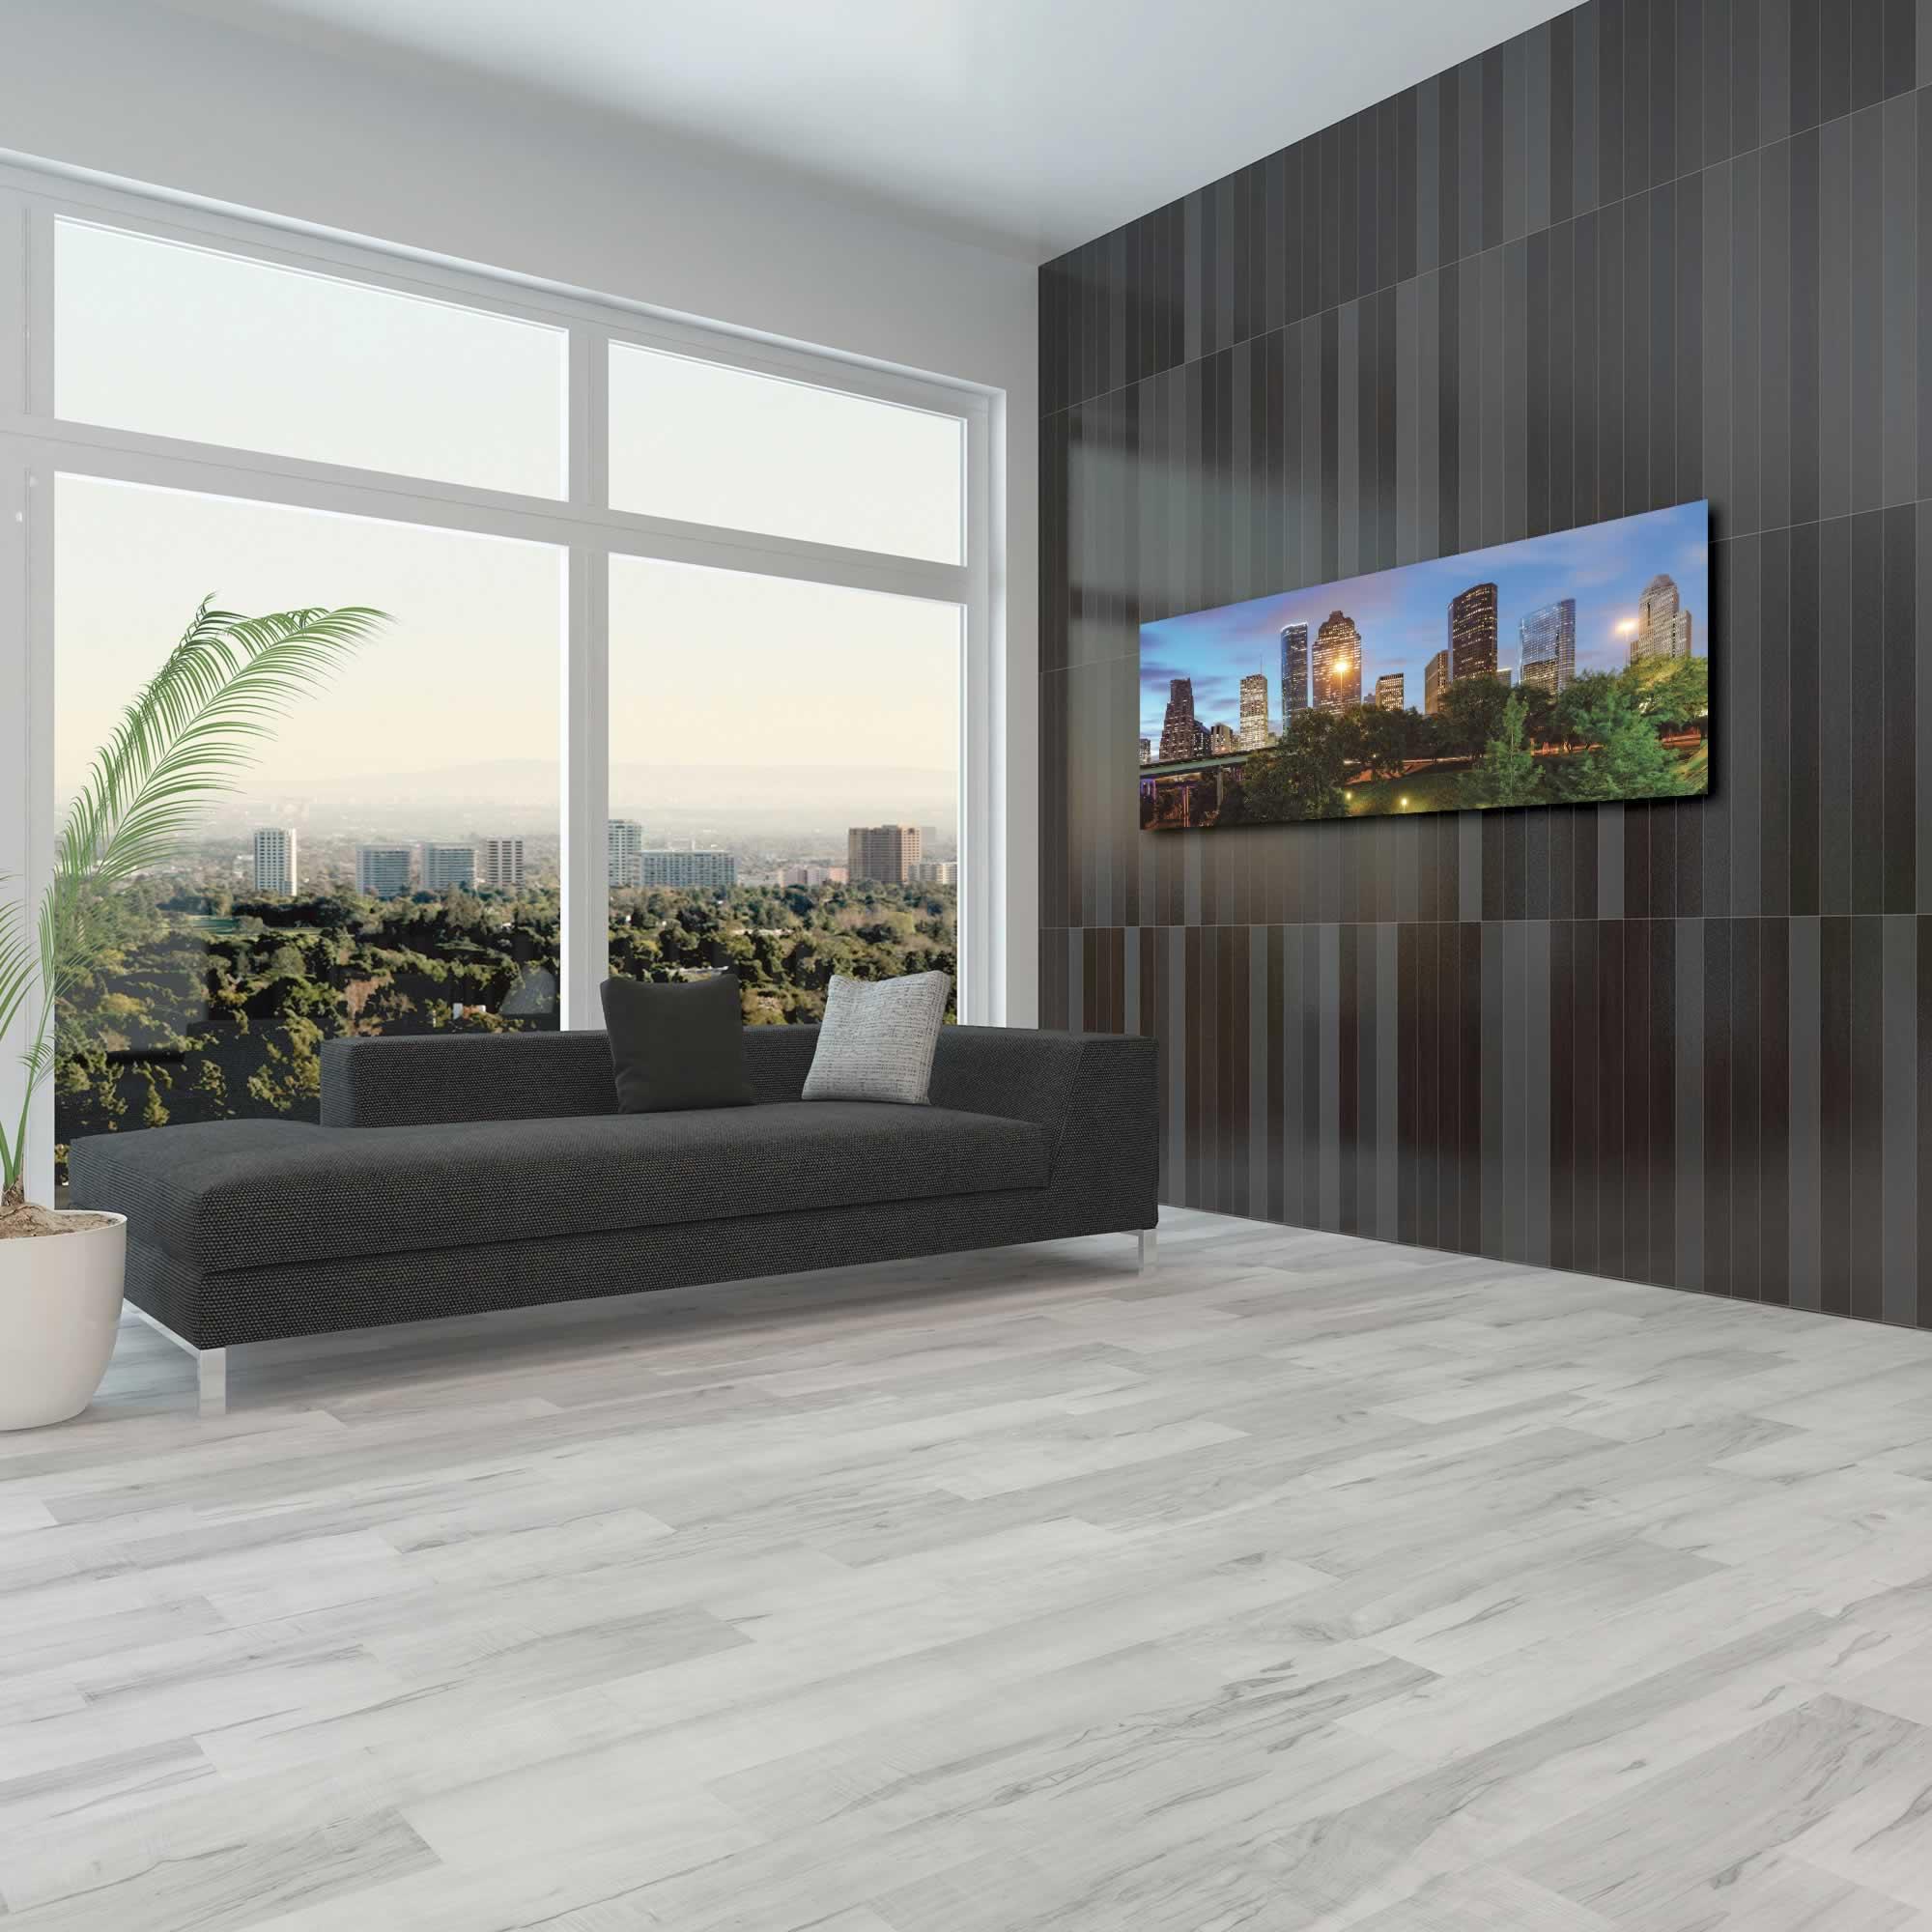 Houston City Skyline - Urban Modern Art, Designer Home Decor, Cityscape Wall Artwork, Trendy Contemporary Art - Alternate View 3